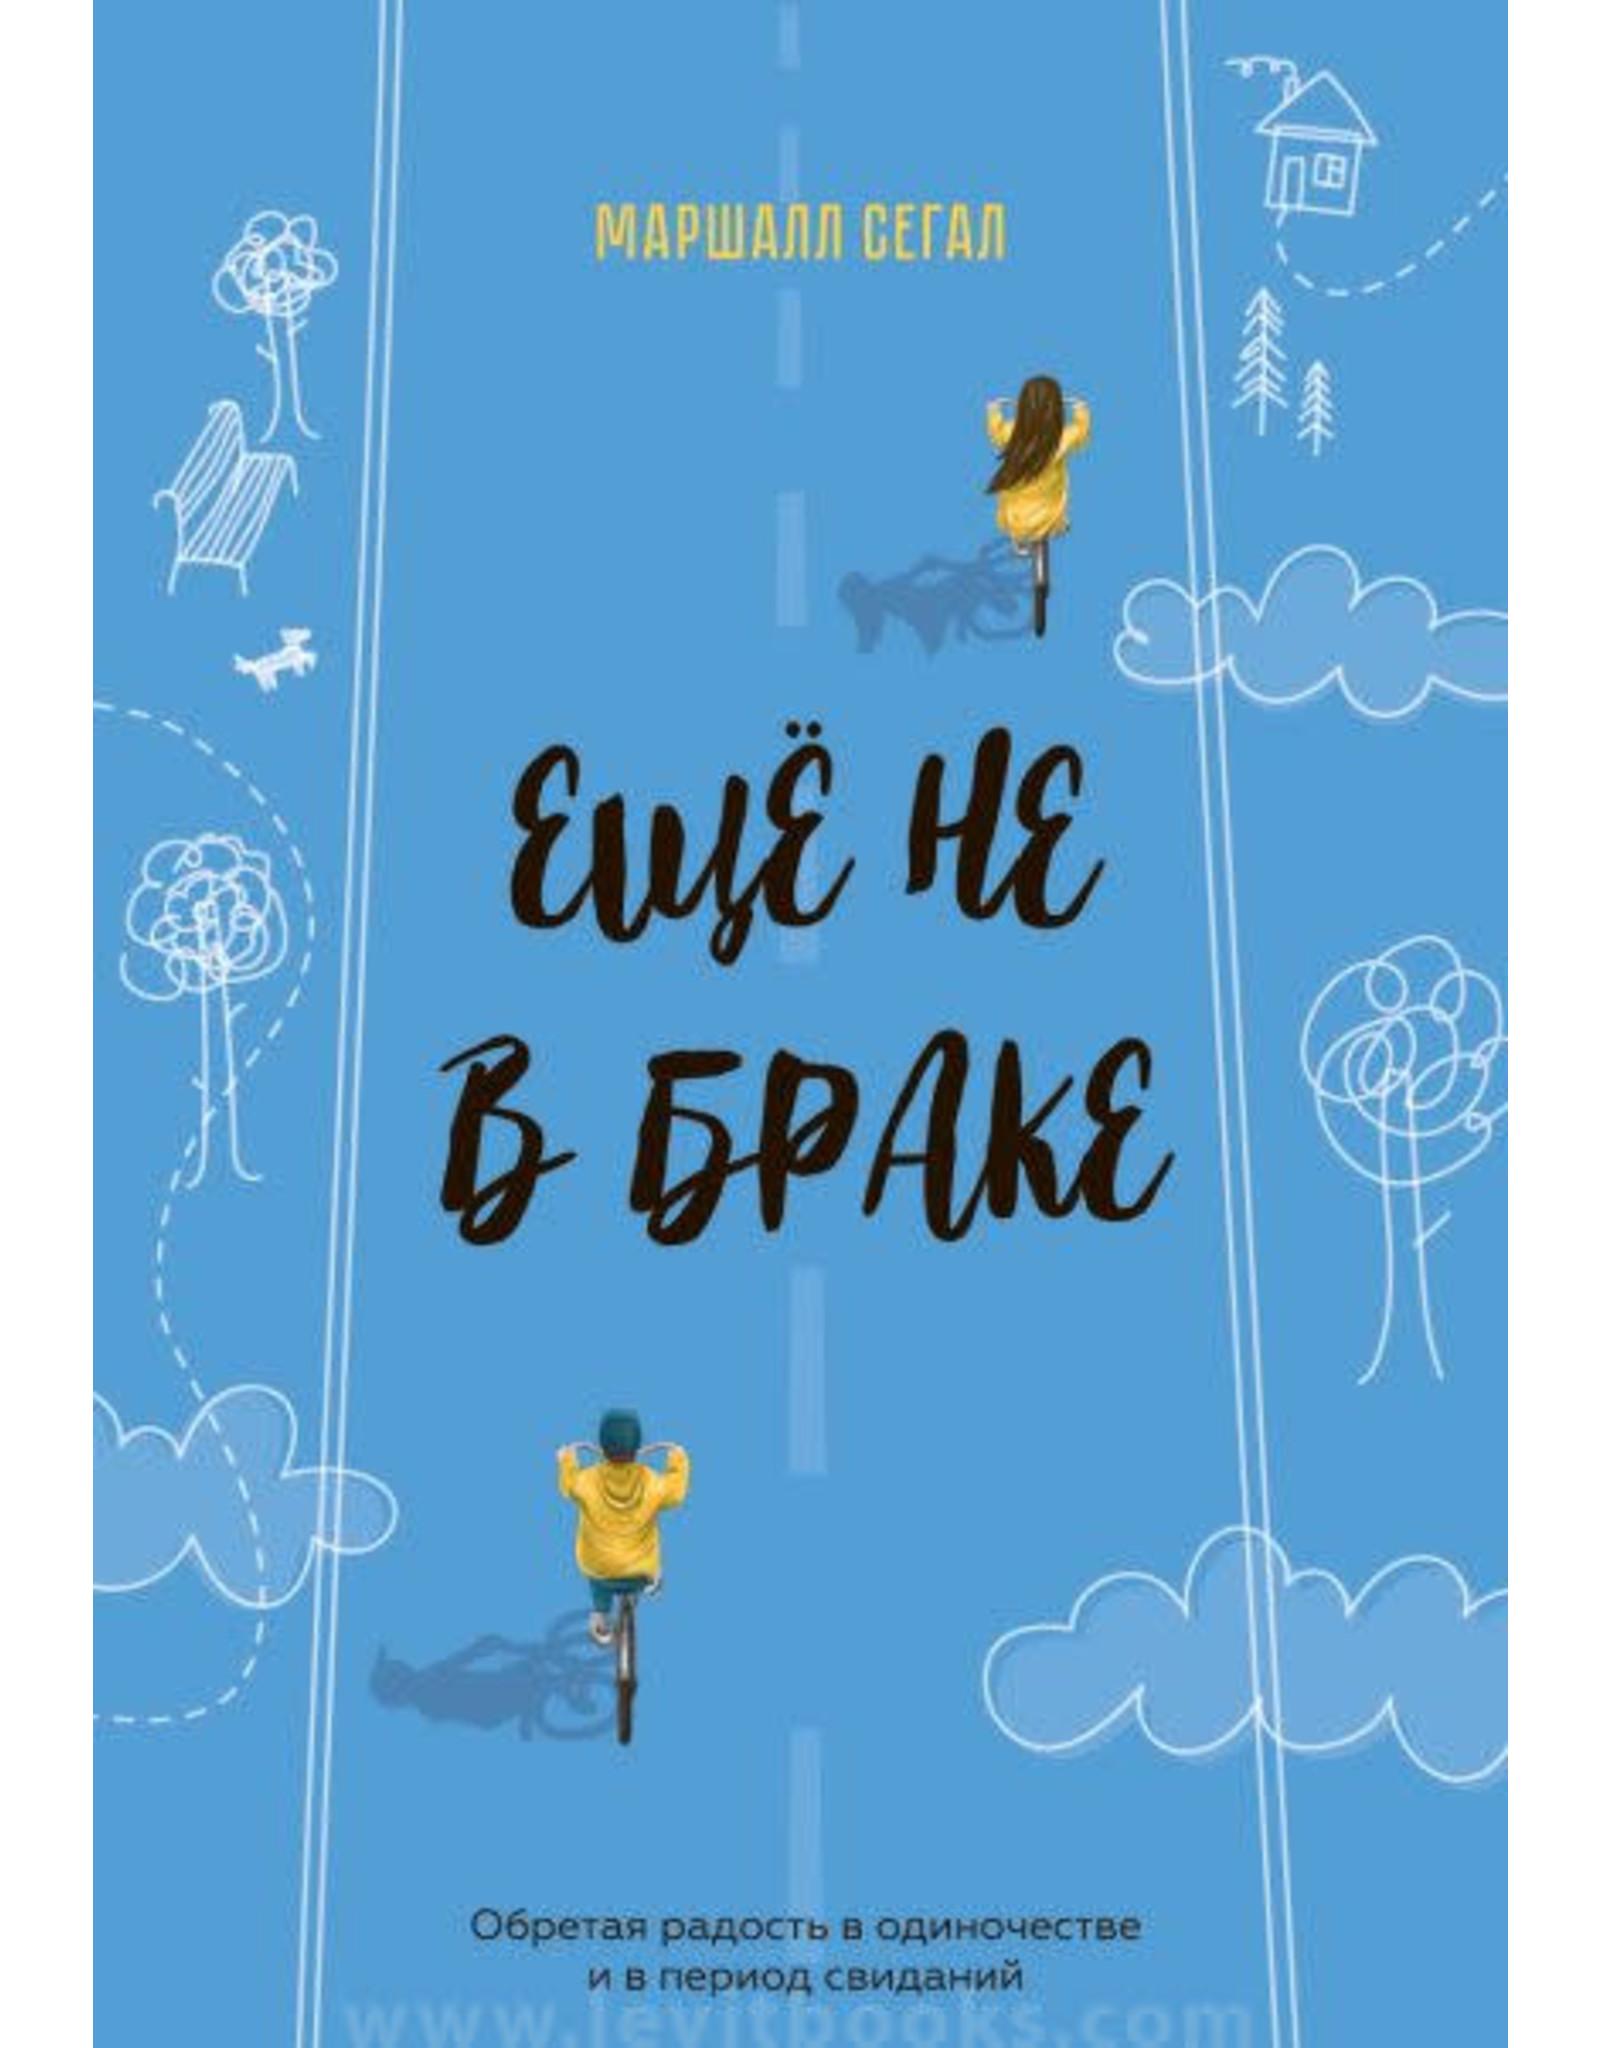 Levit Books Еще не в браке (Not Yet Married)